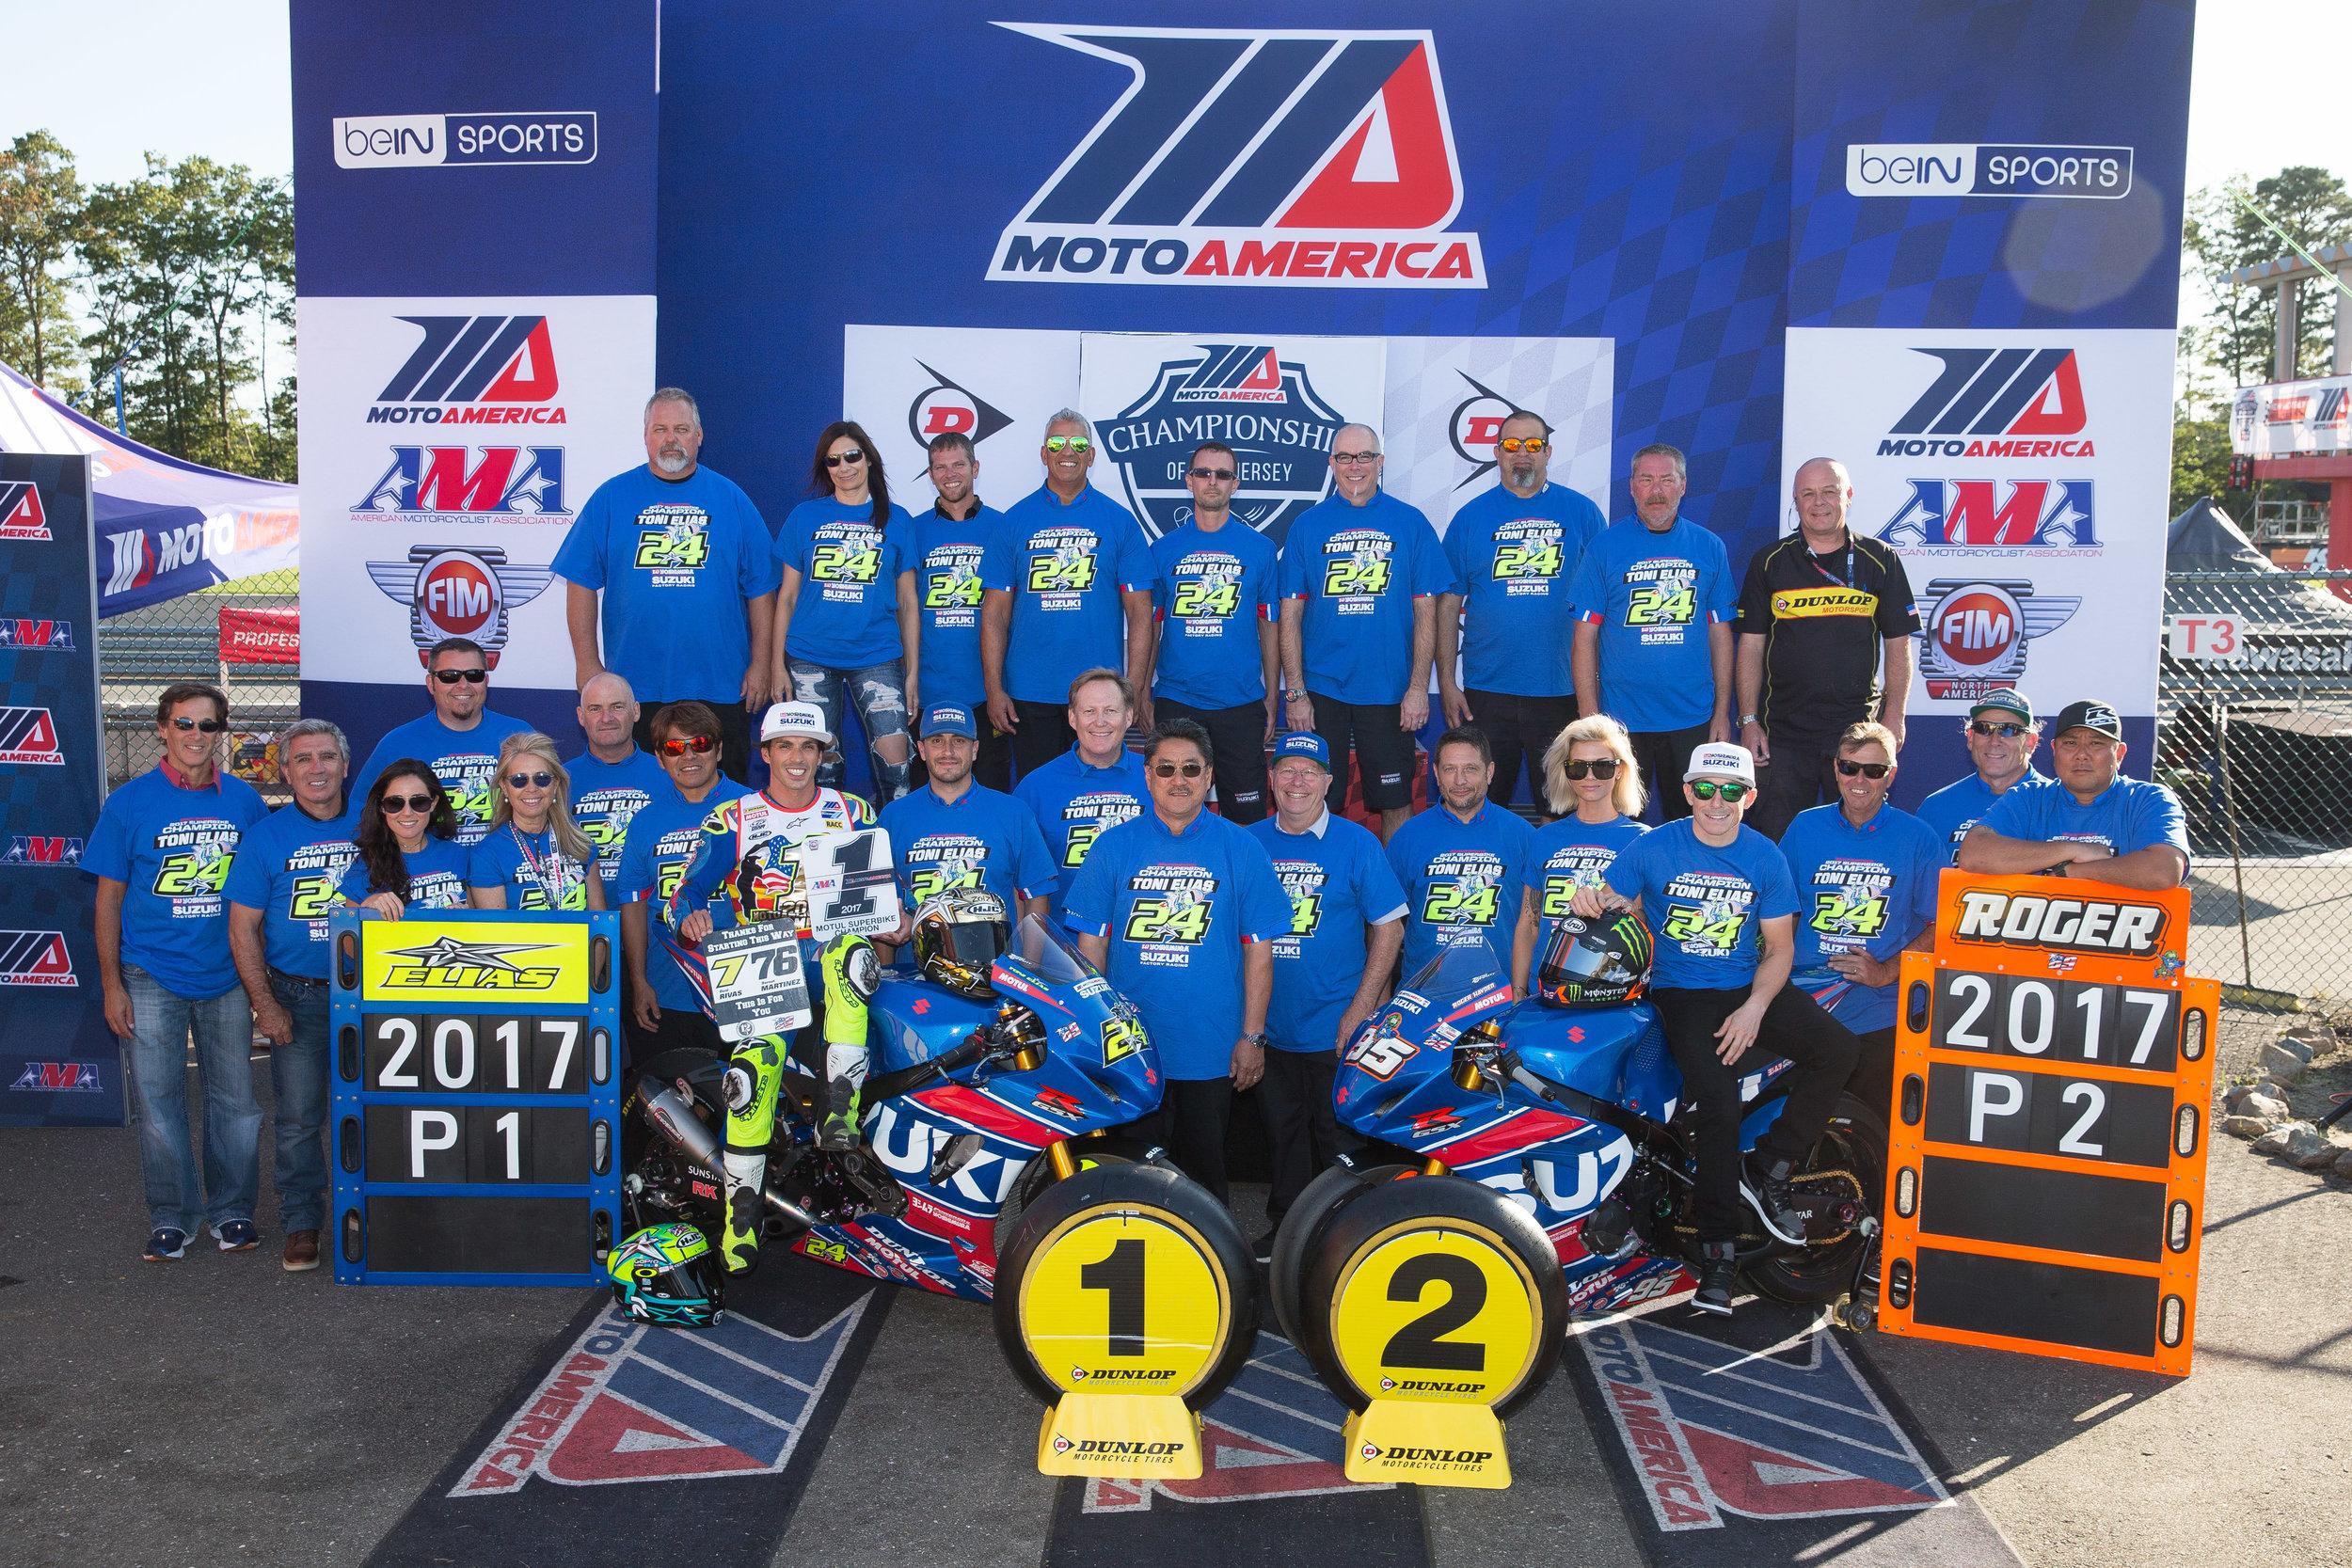 elias-championship-2017-news2.jpg